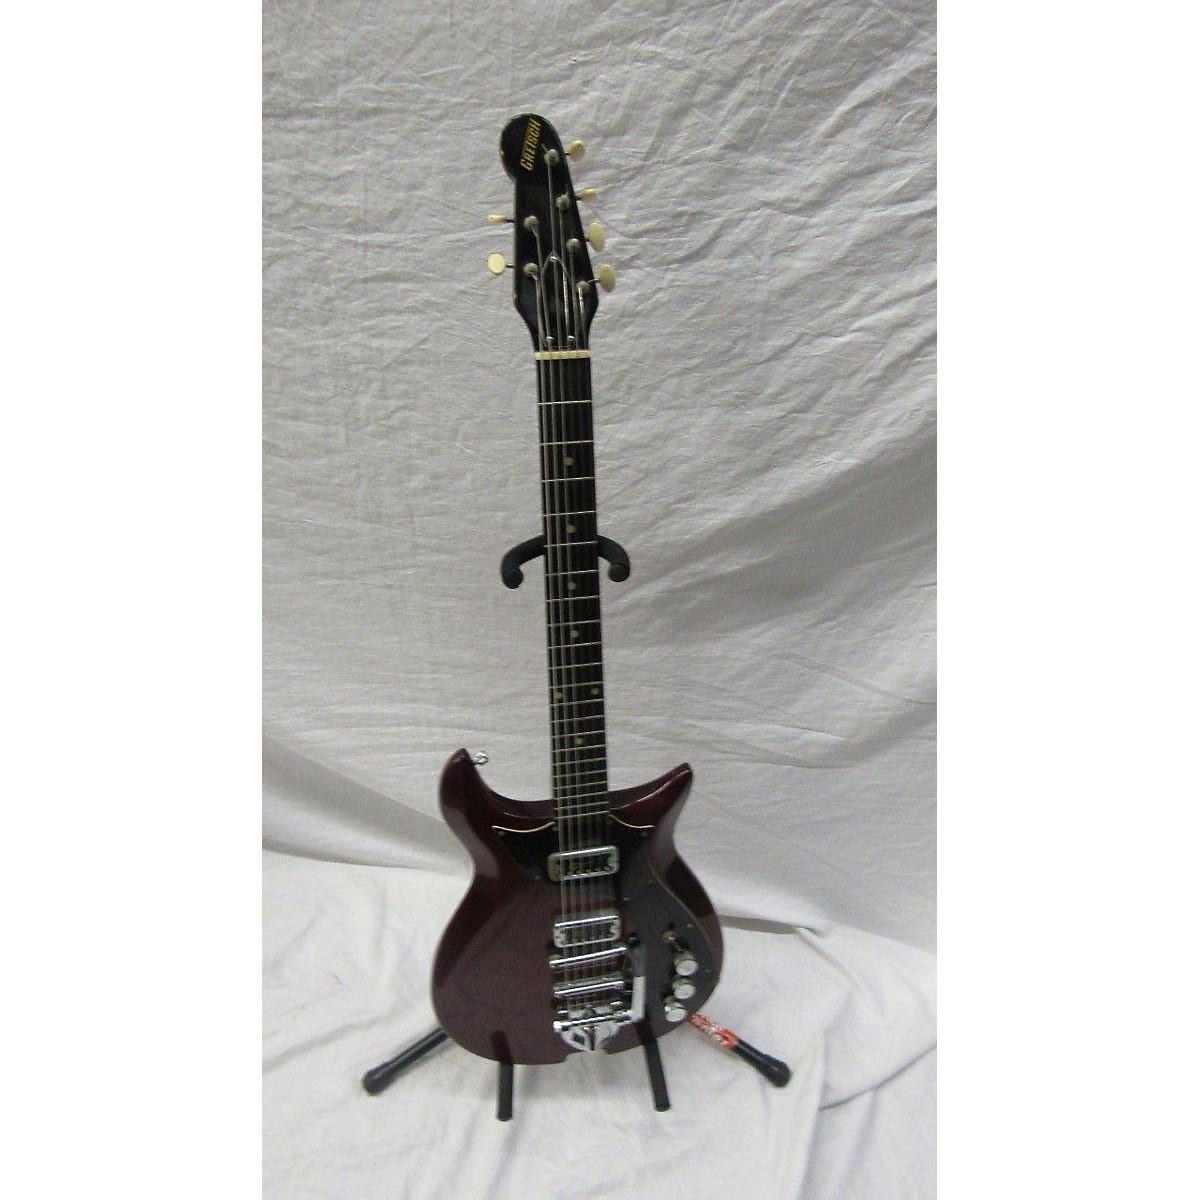 Gretsch Guitars 1965 Corvette Solid Body Electric Guitar